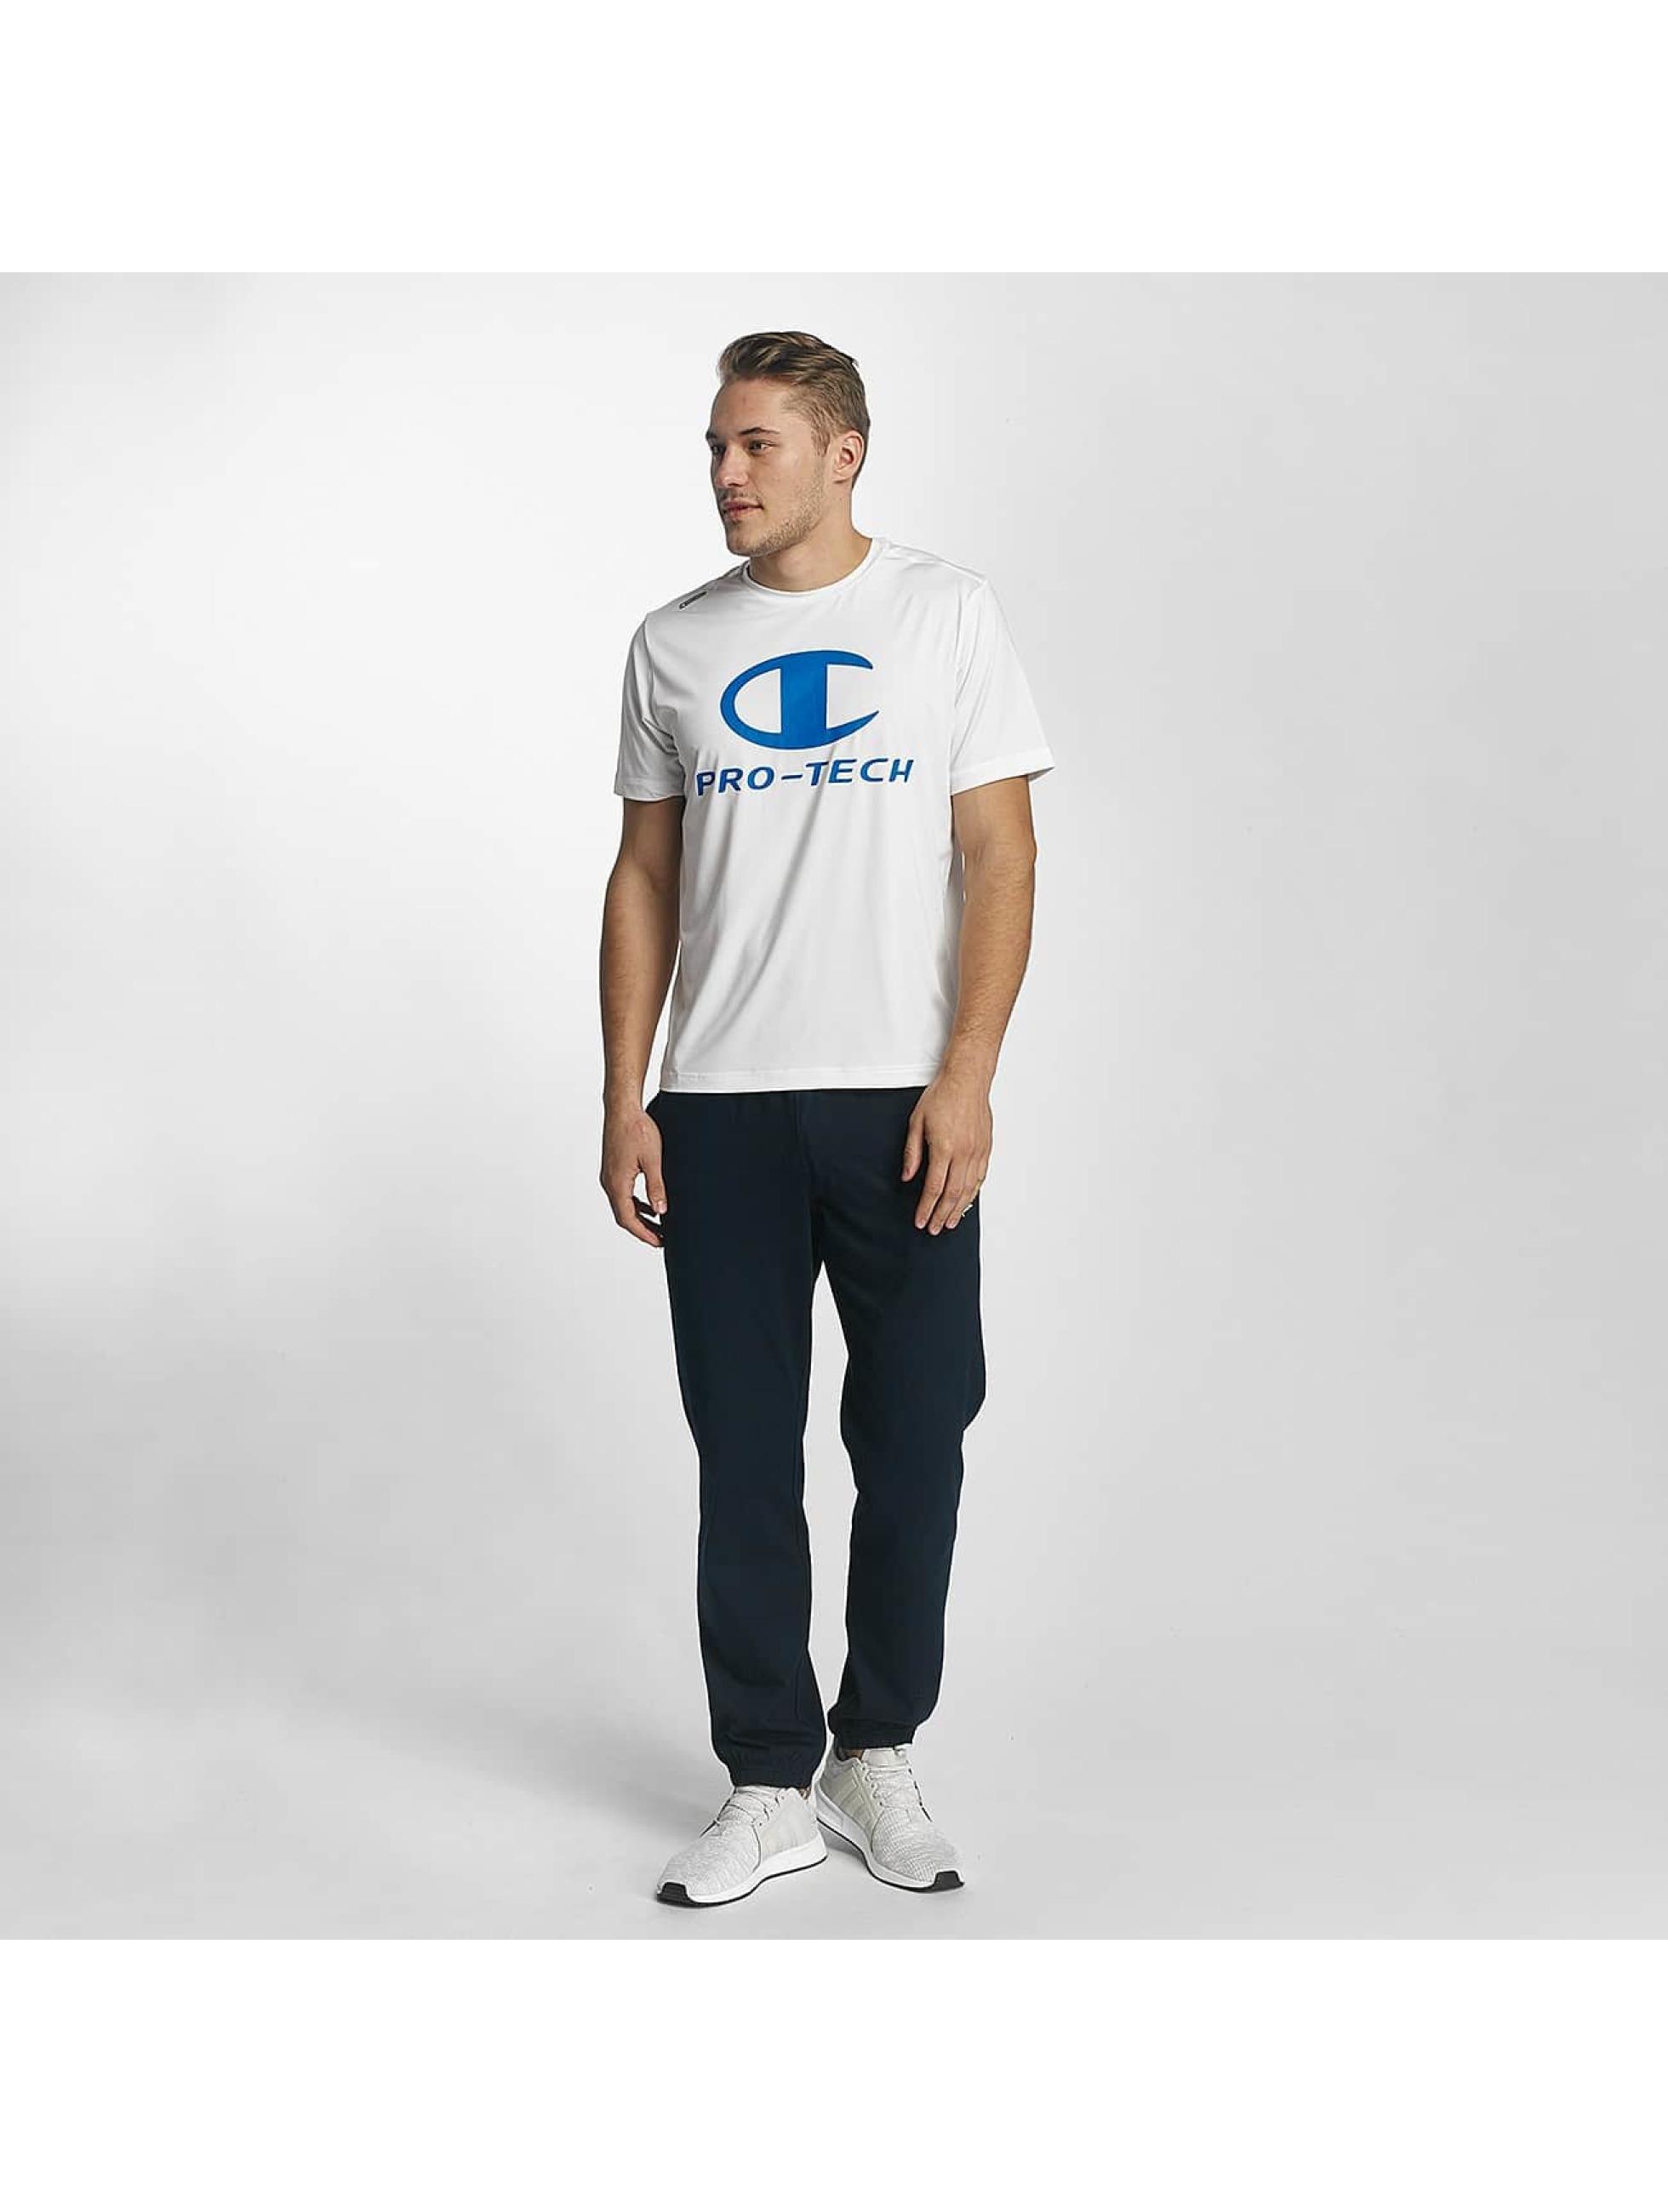 Champion Athletics T-Shirt Pro Tech weiß